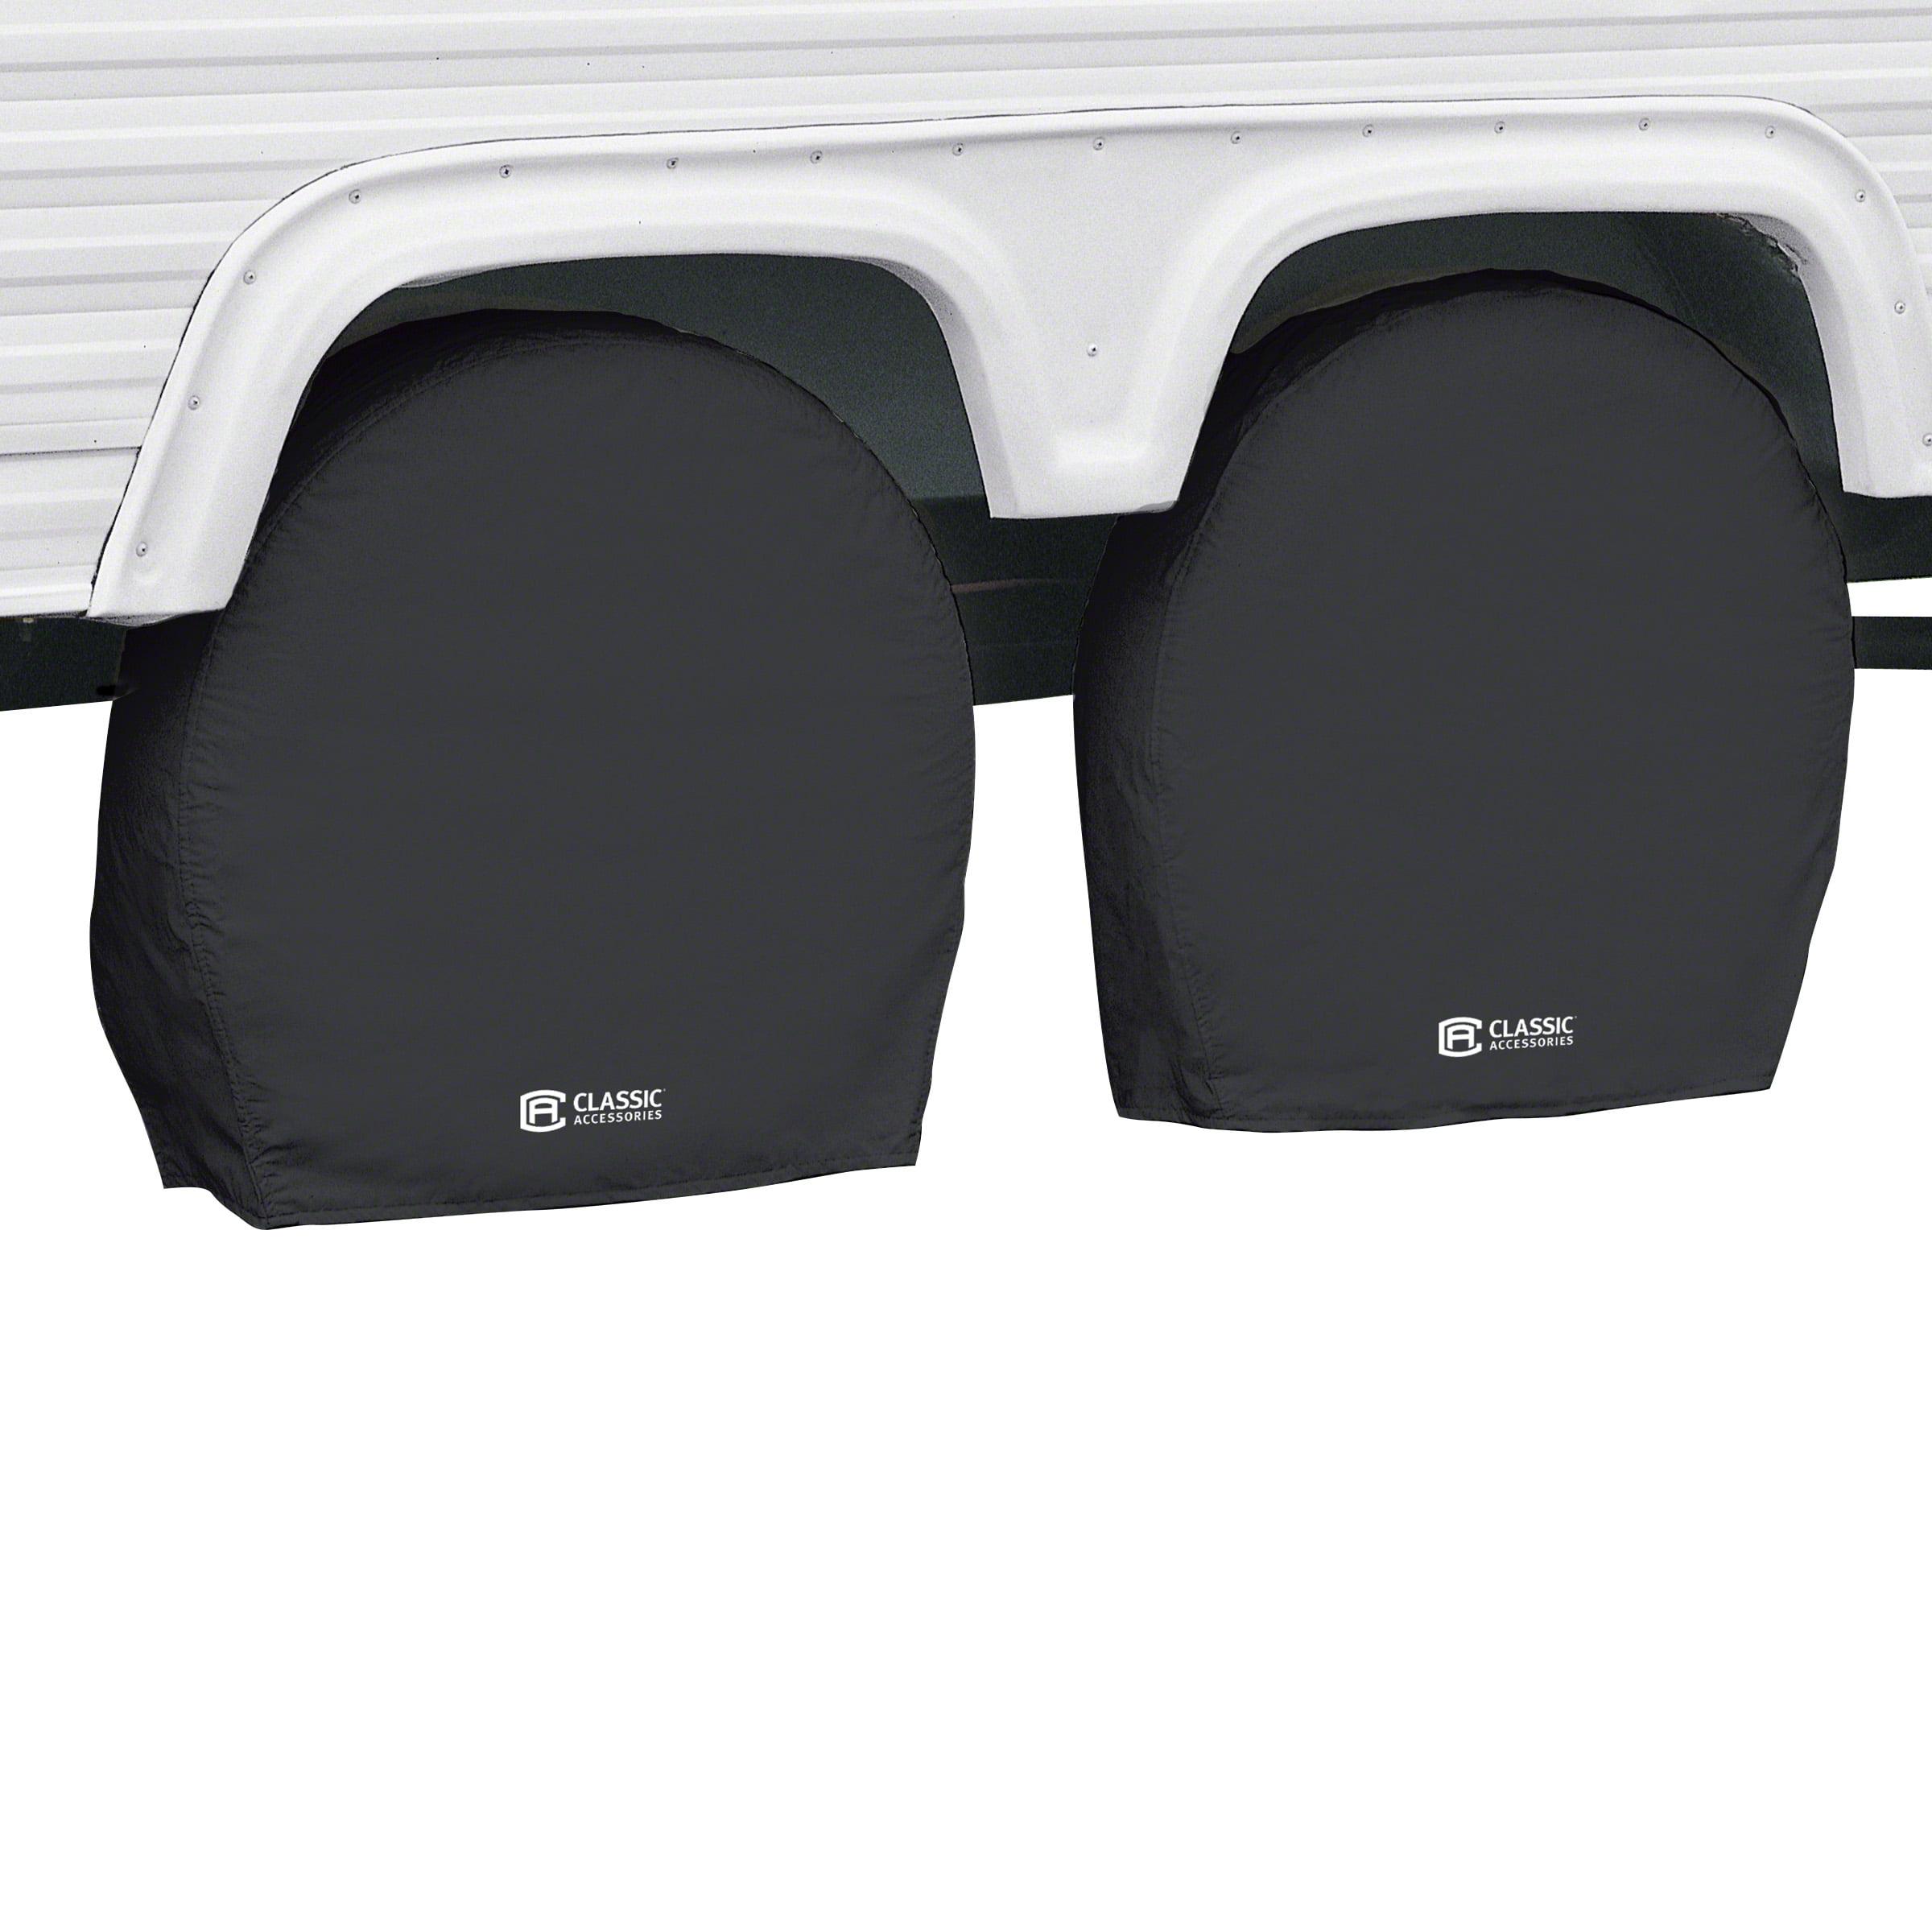 "Classic Accessories OverDrive RV Wheel Covers (2-pack), Black, Choose Wheel Diameter 18"" - 41"""